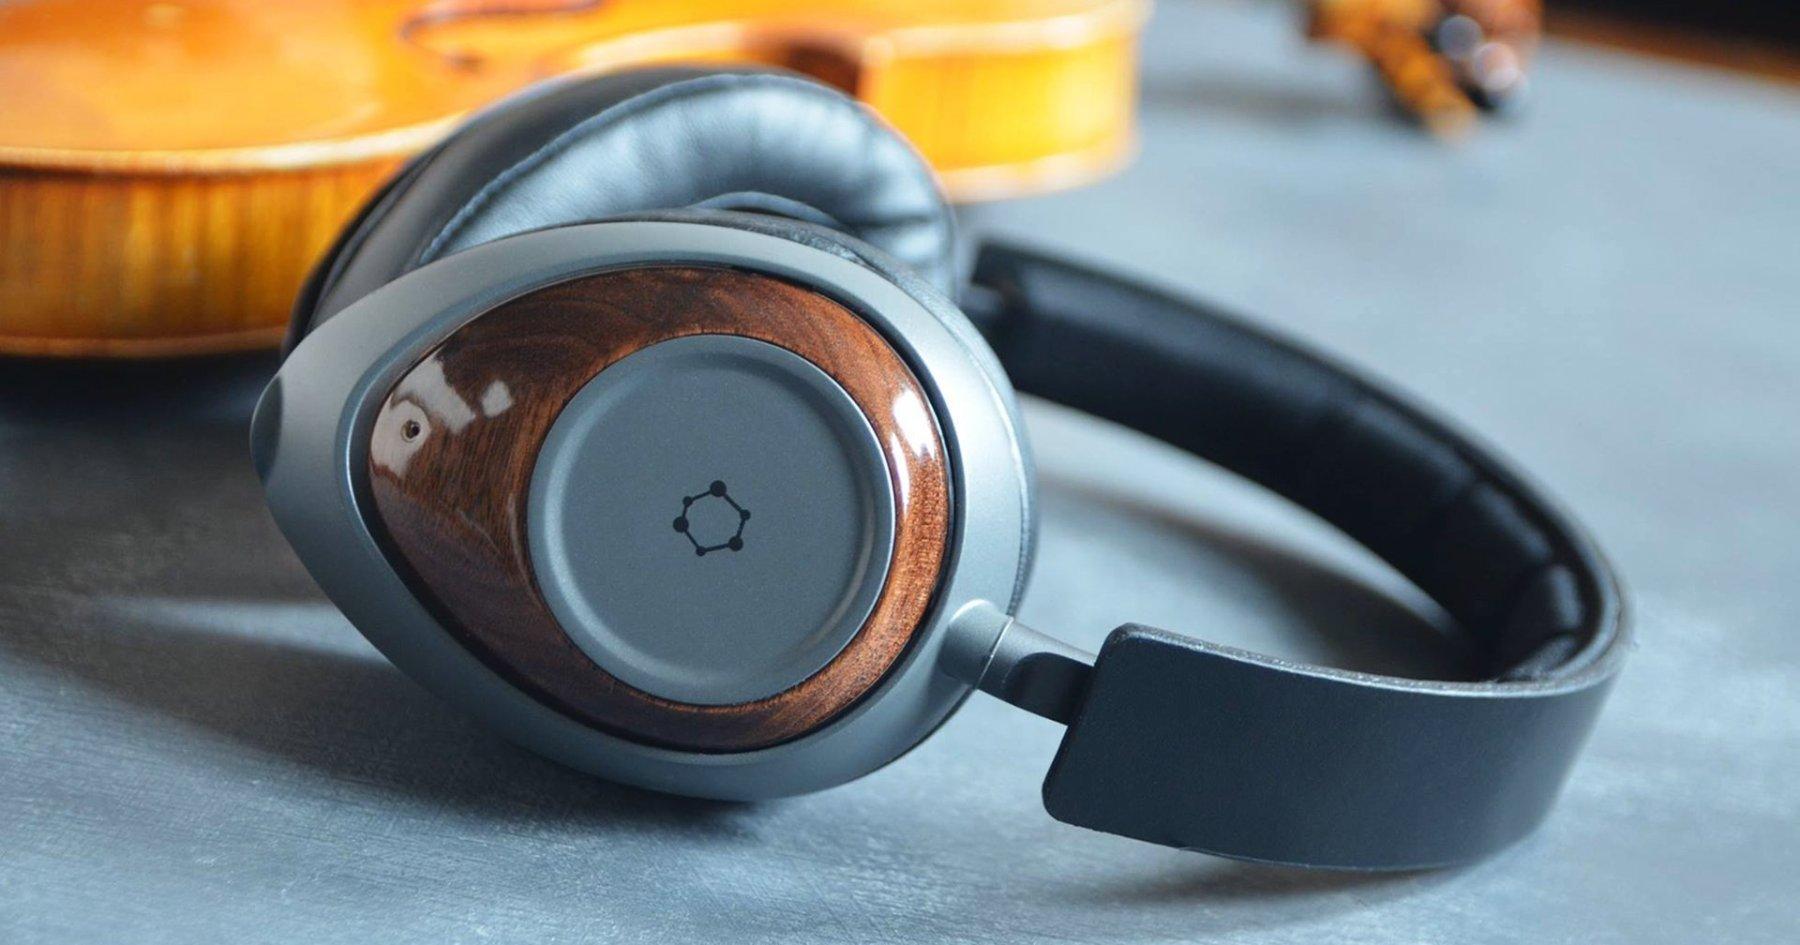 These Wireless Headphones Deserve a Nobel Prize